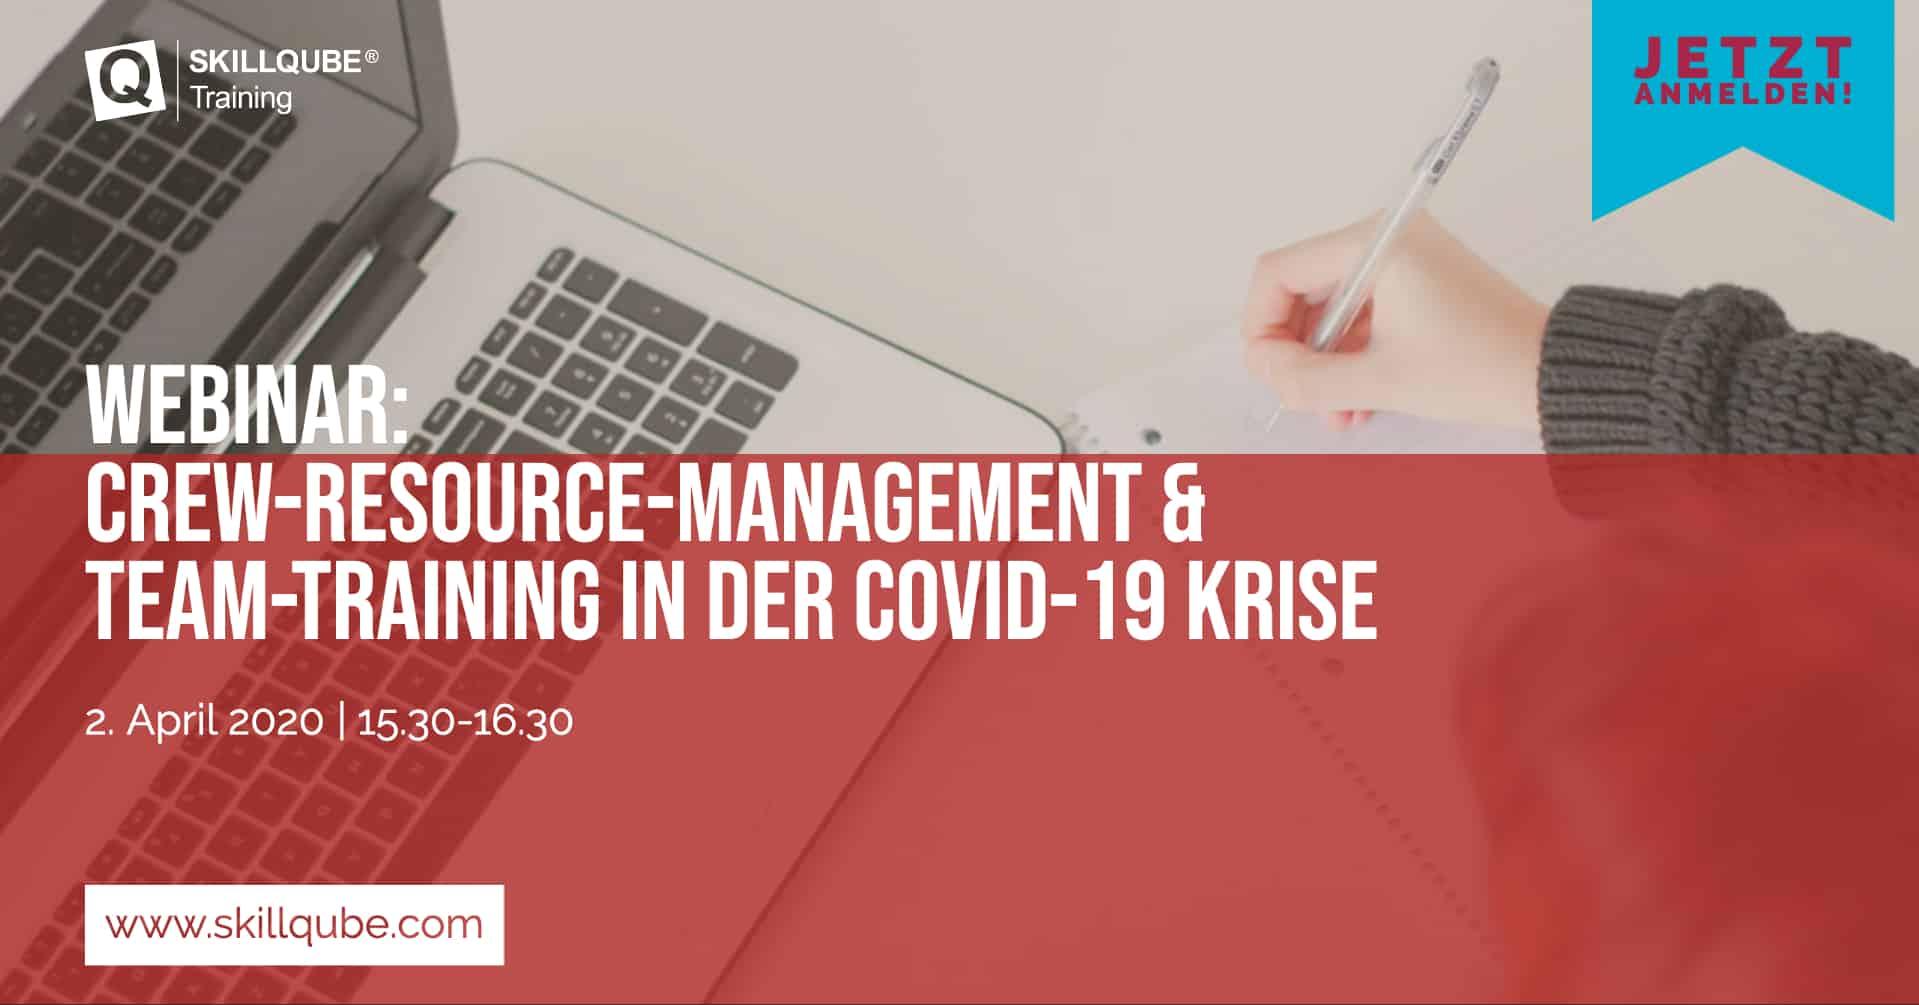 Skillqube bietet Webinar zum Thema CRM & Team-Training in der COVID-19 Krise